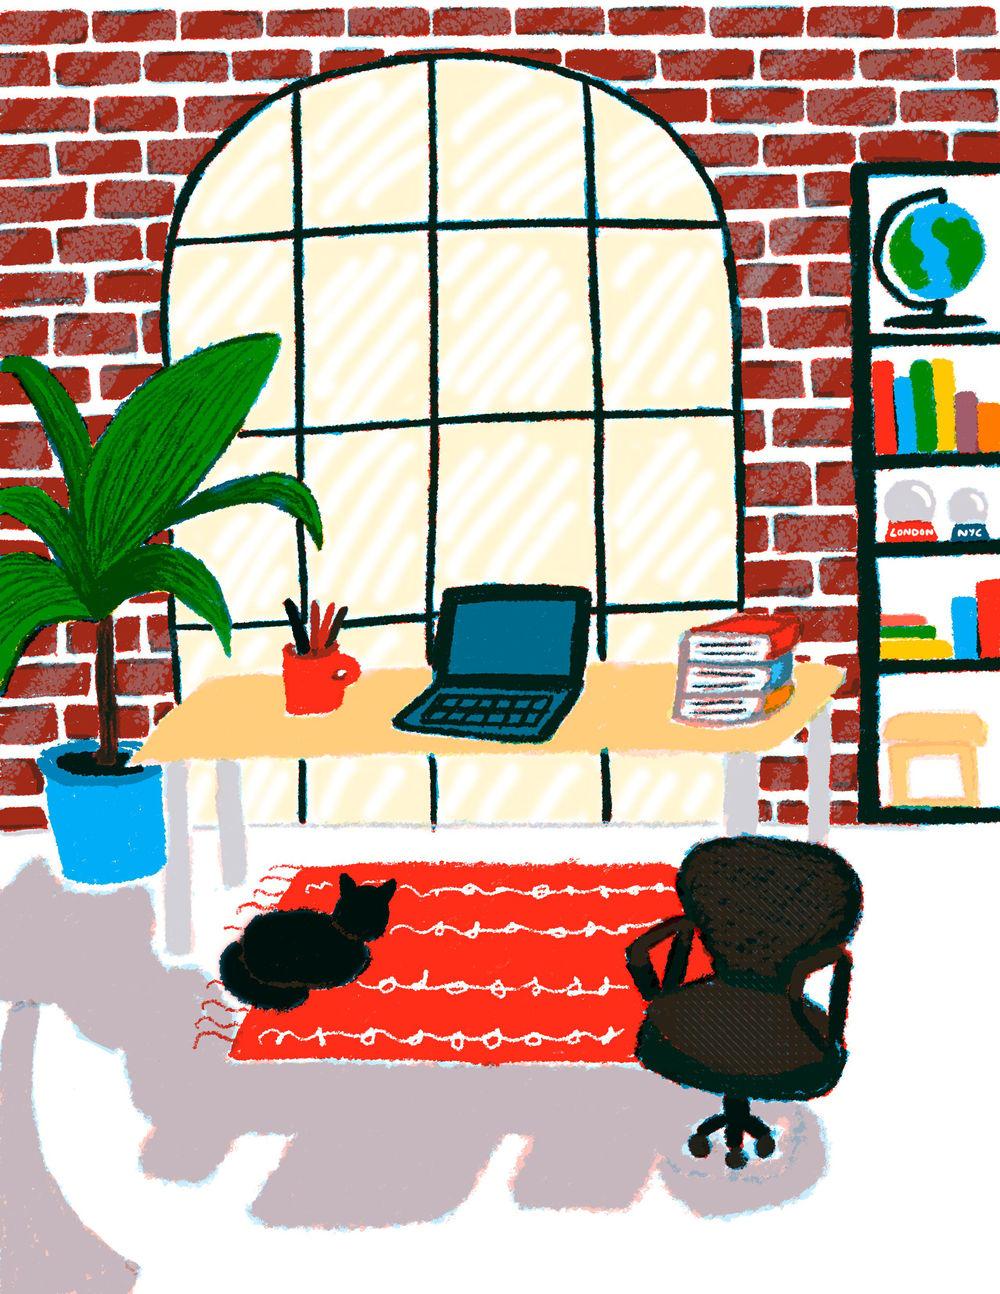 My Dream Studio - image 1 - student project